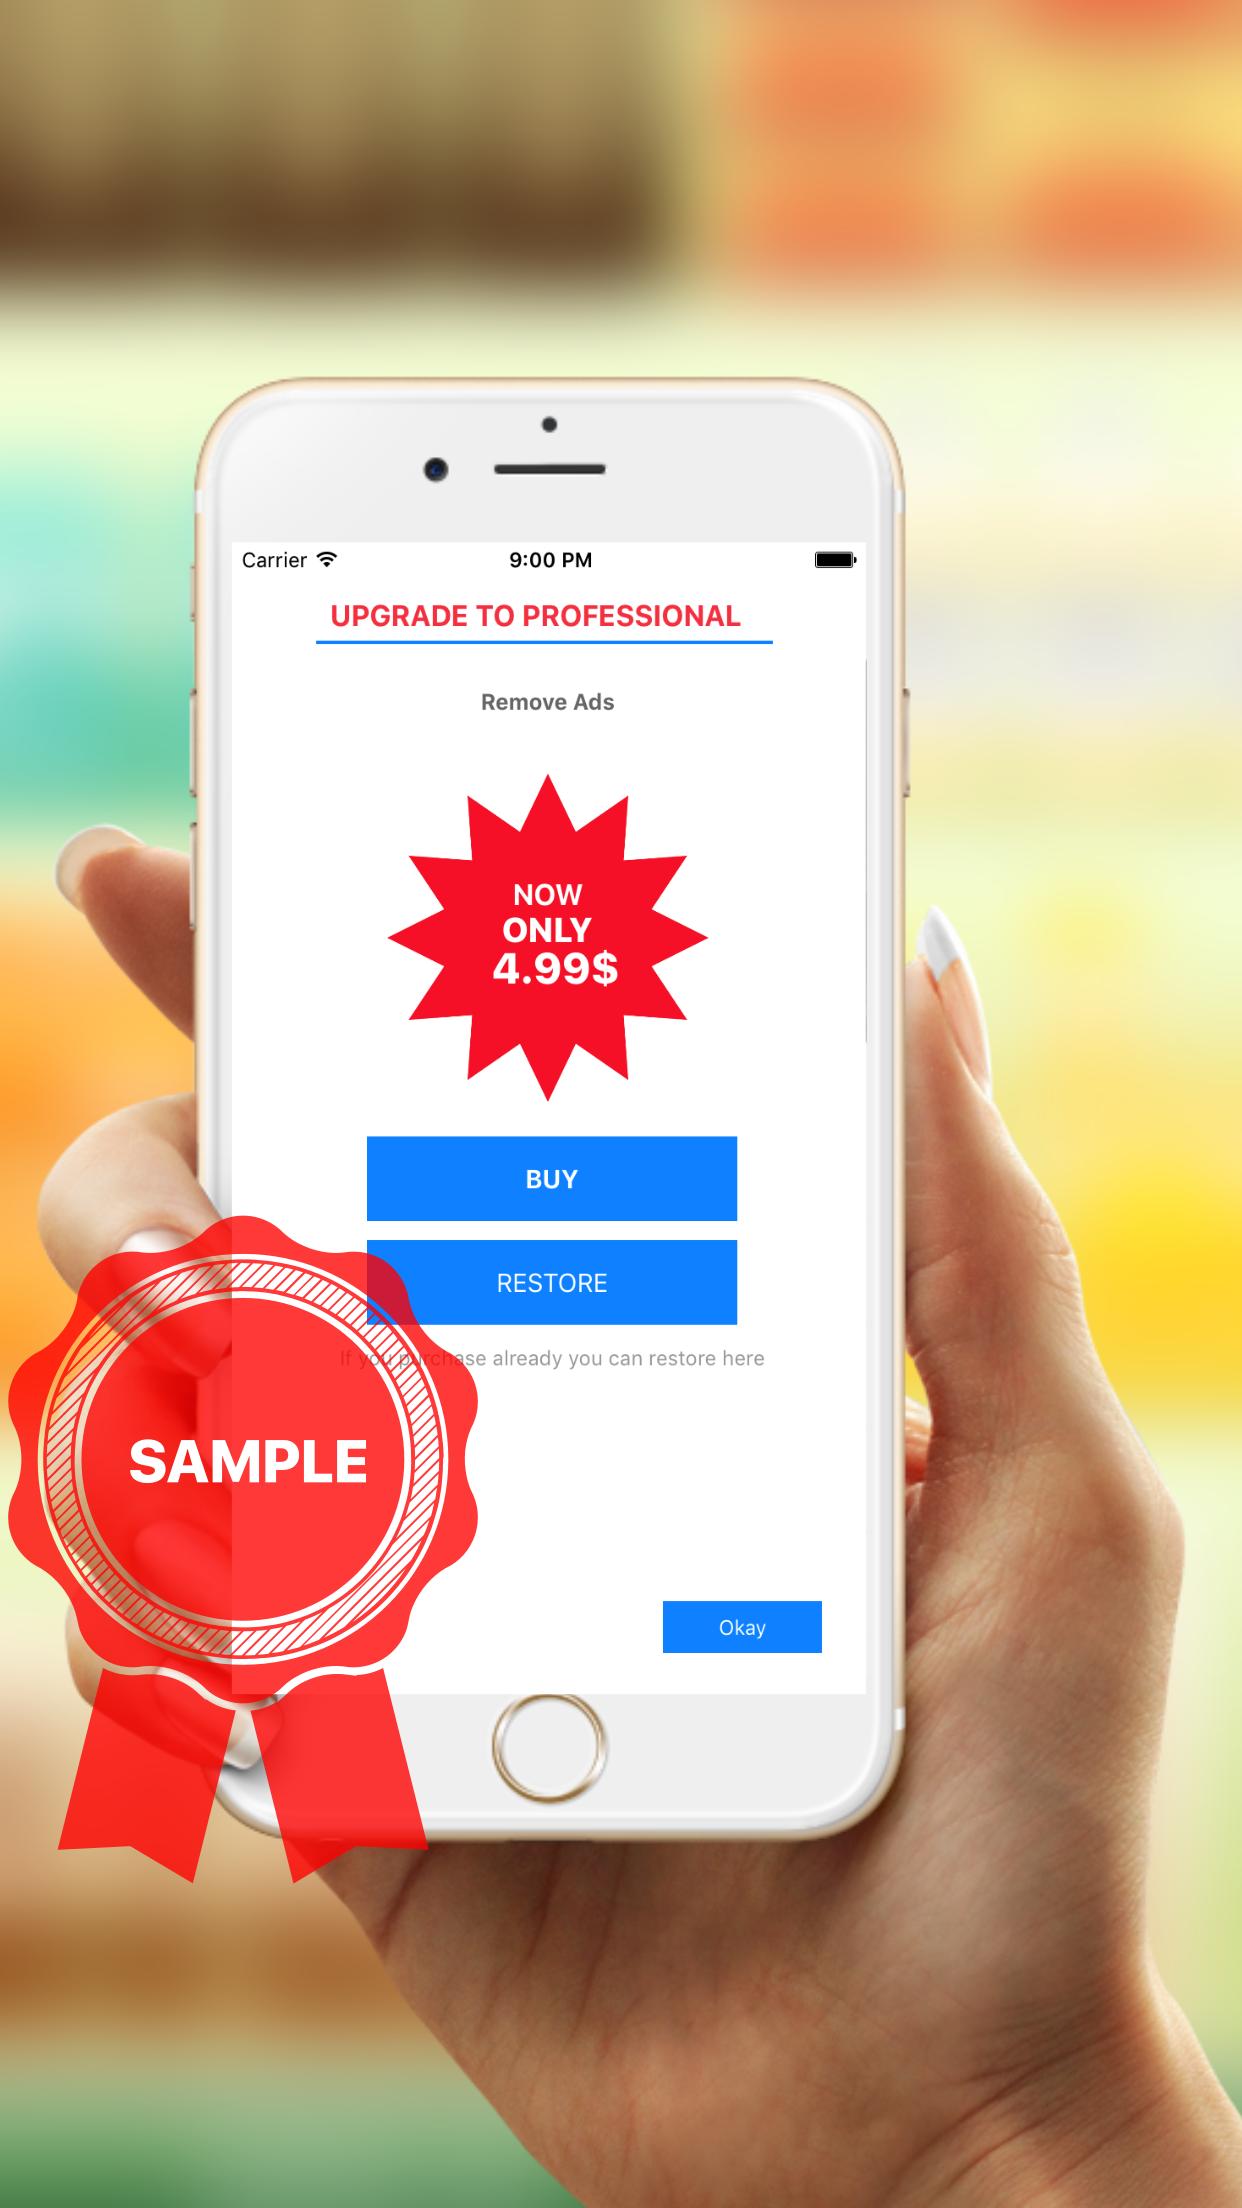 QR Code Reader - Swift 5 - AdMob - In App Purchase